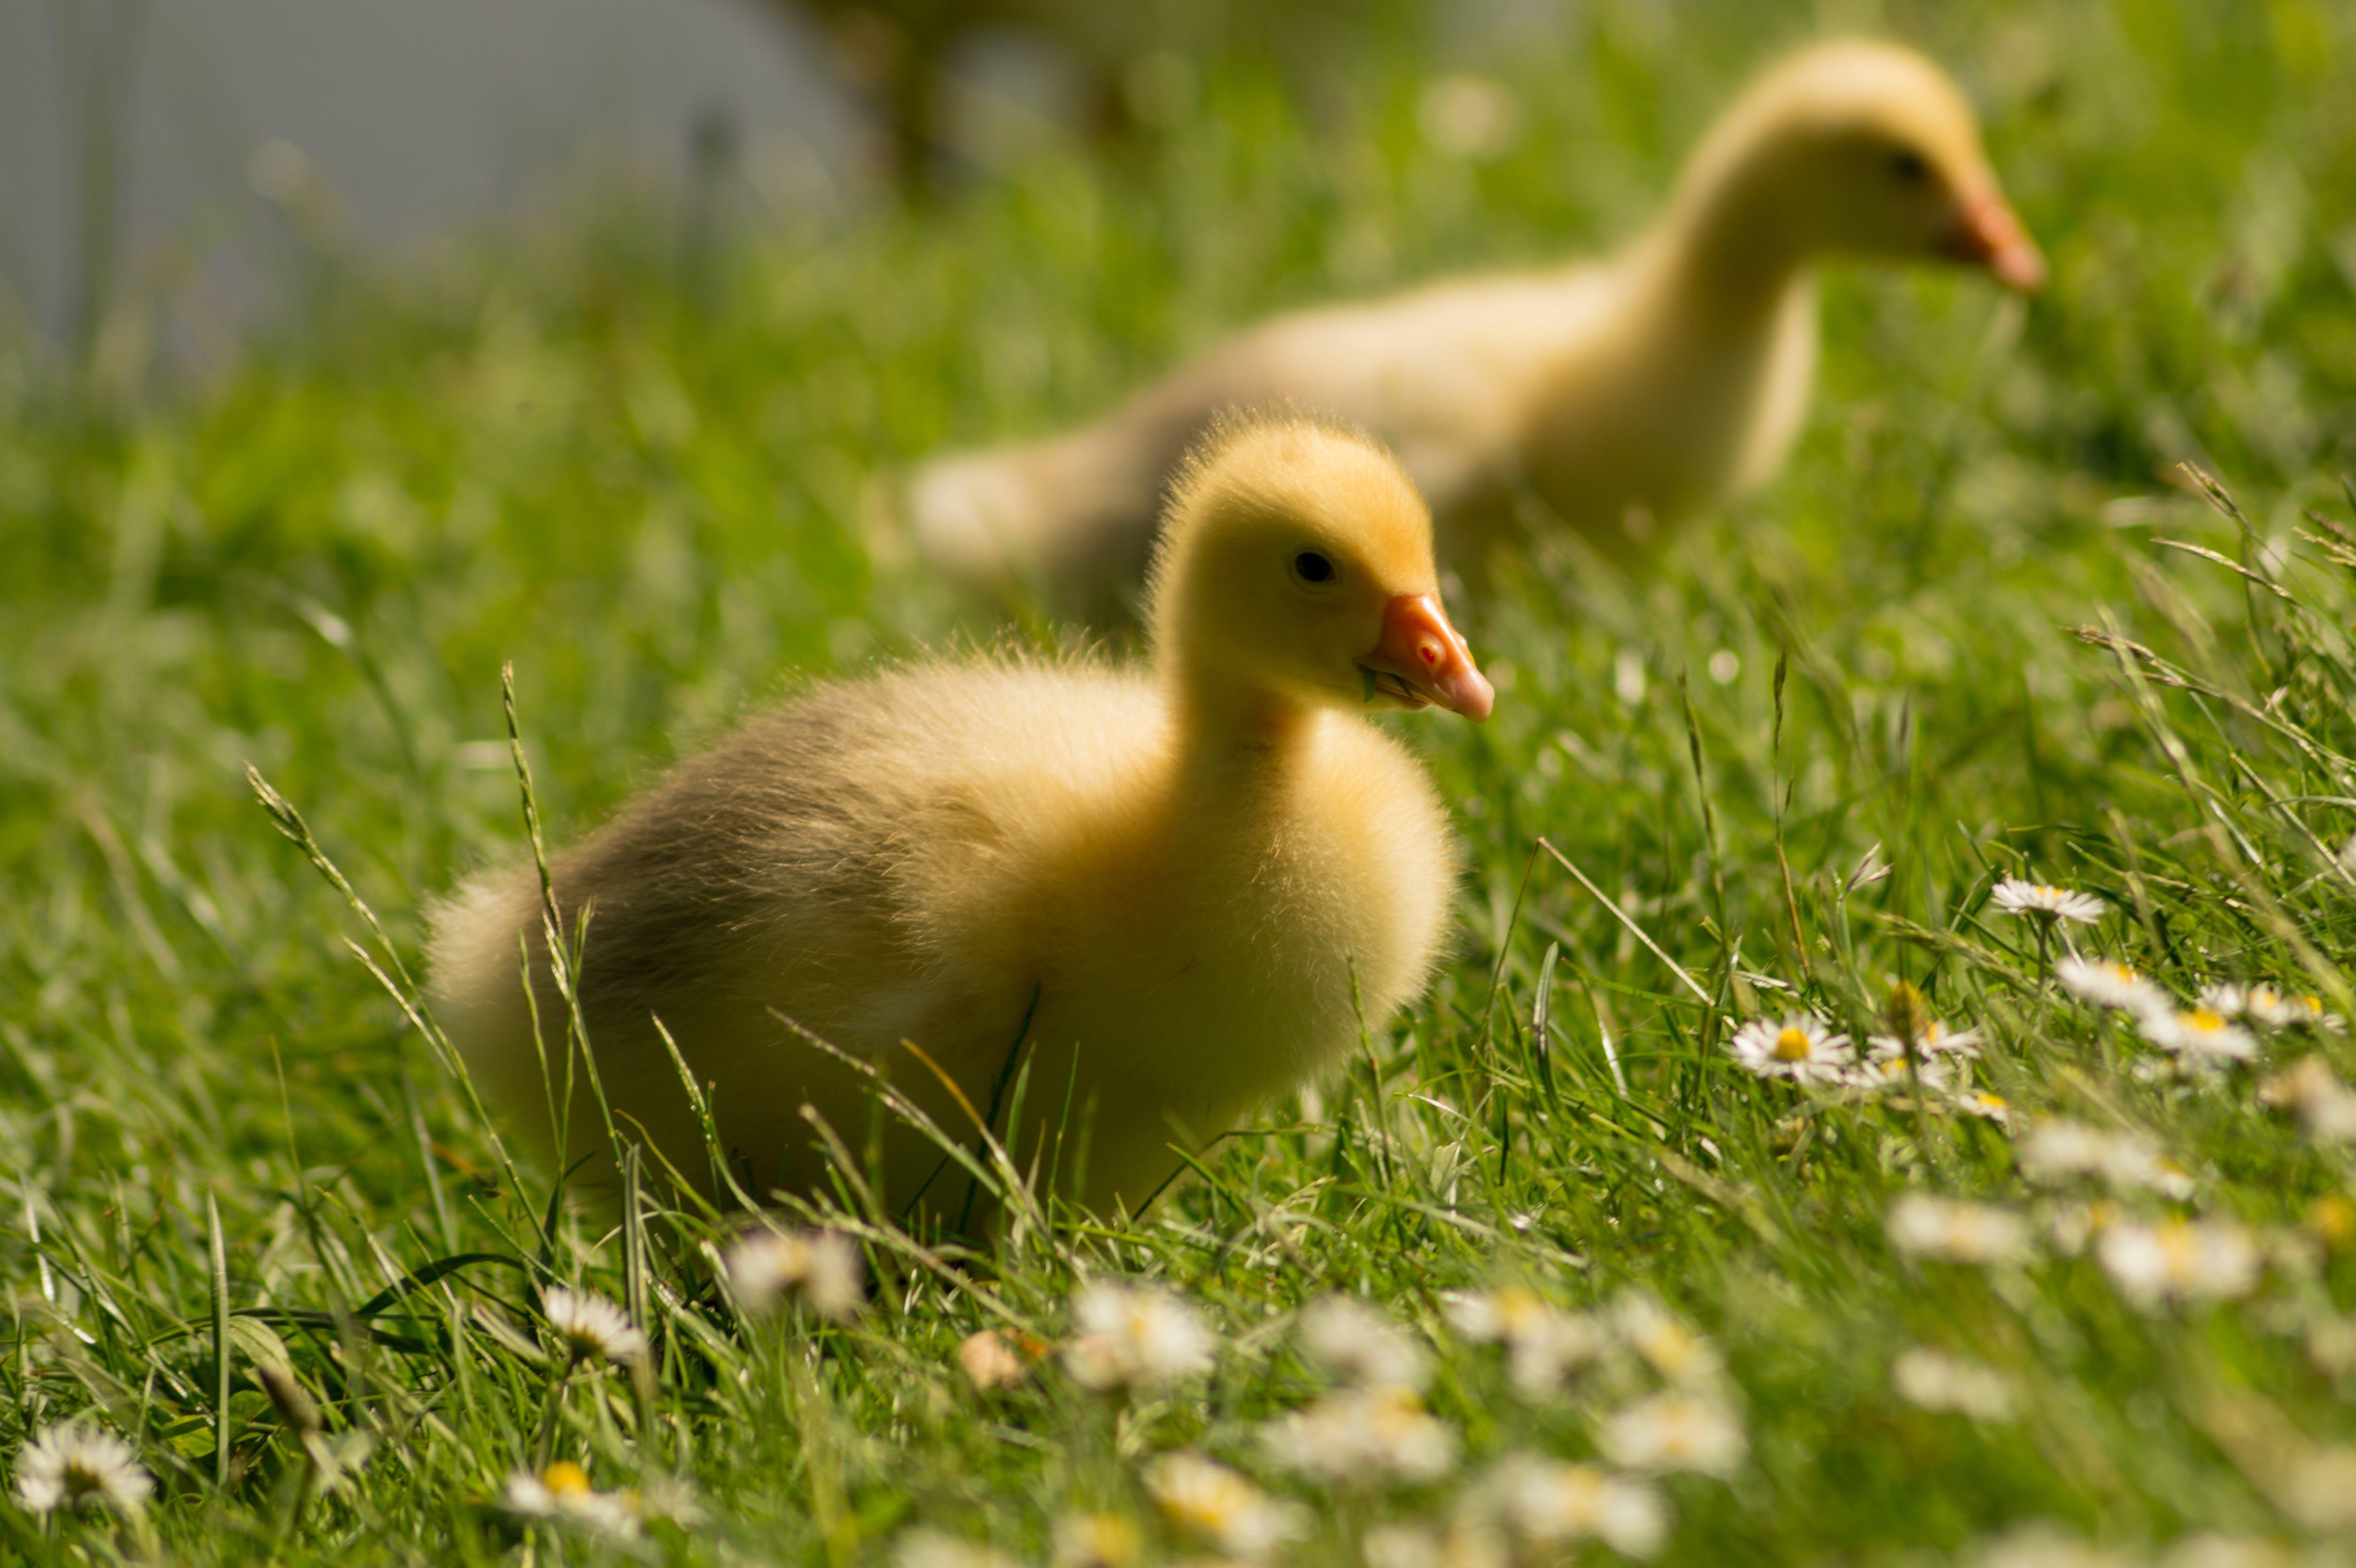 beesten, chicks, close-up view